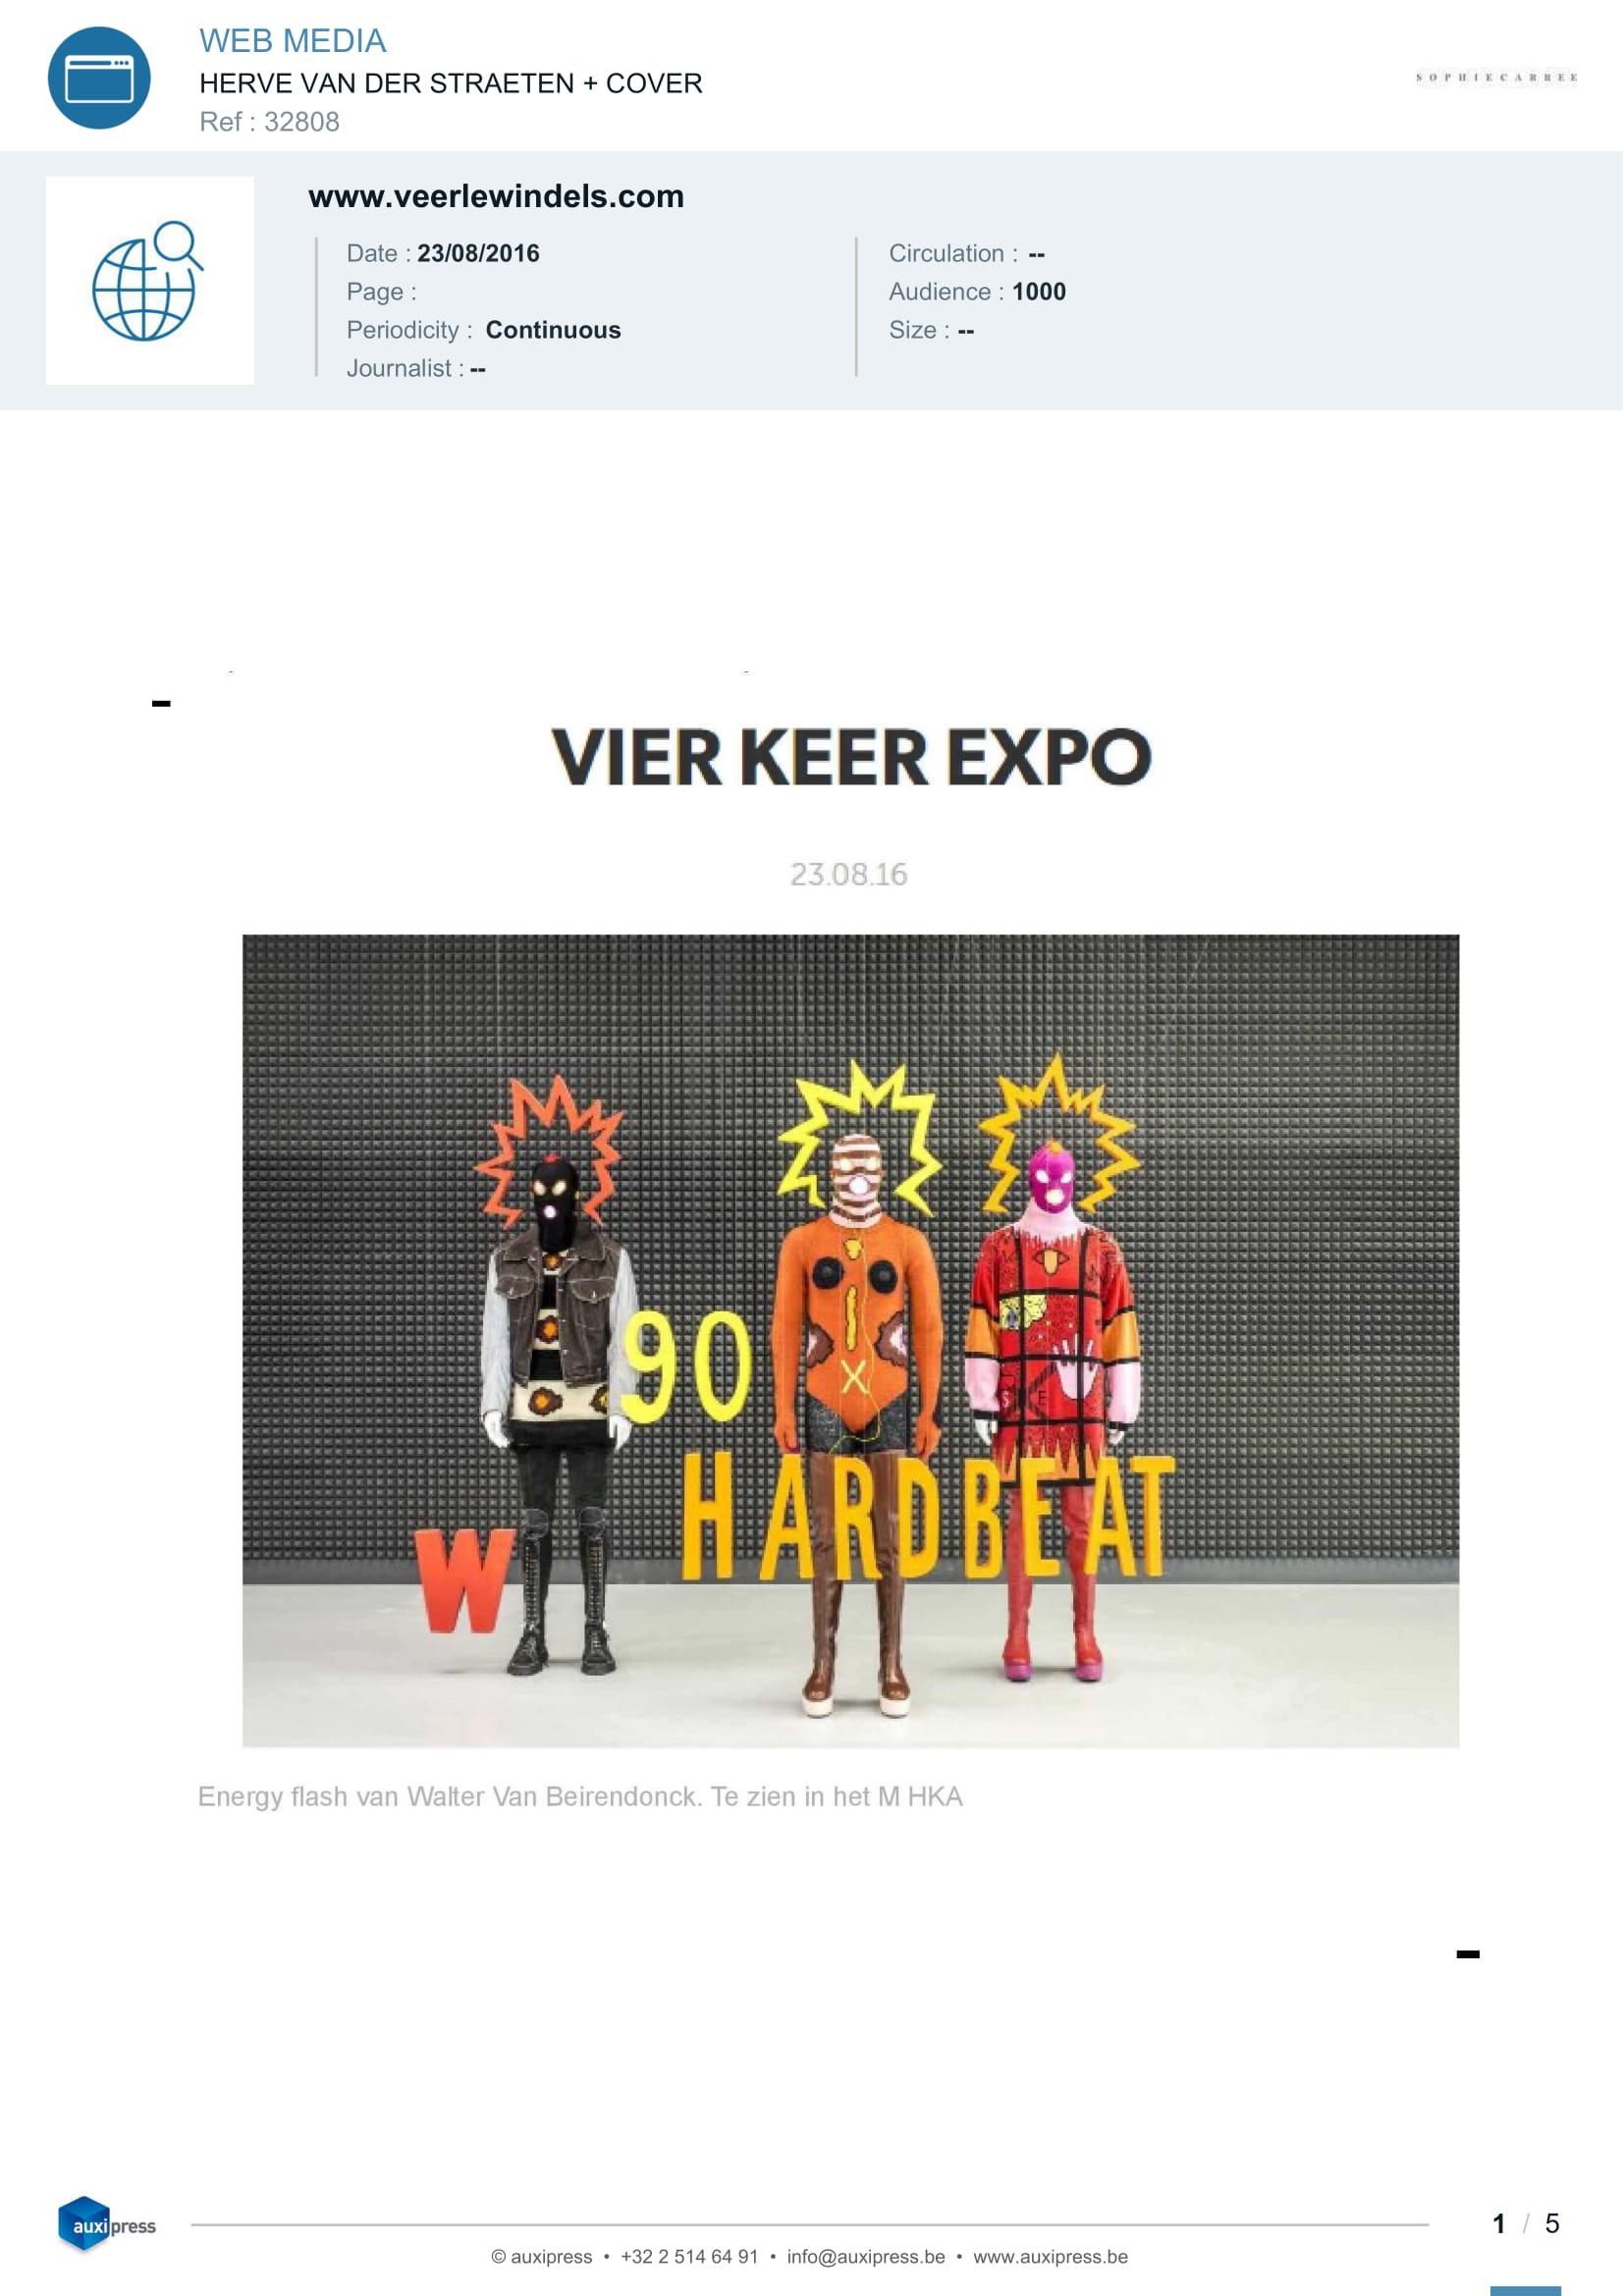 Veerlewindels.com — Aug. 2016